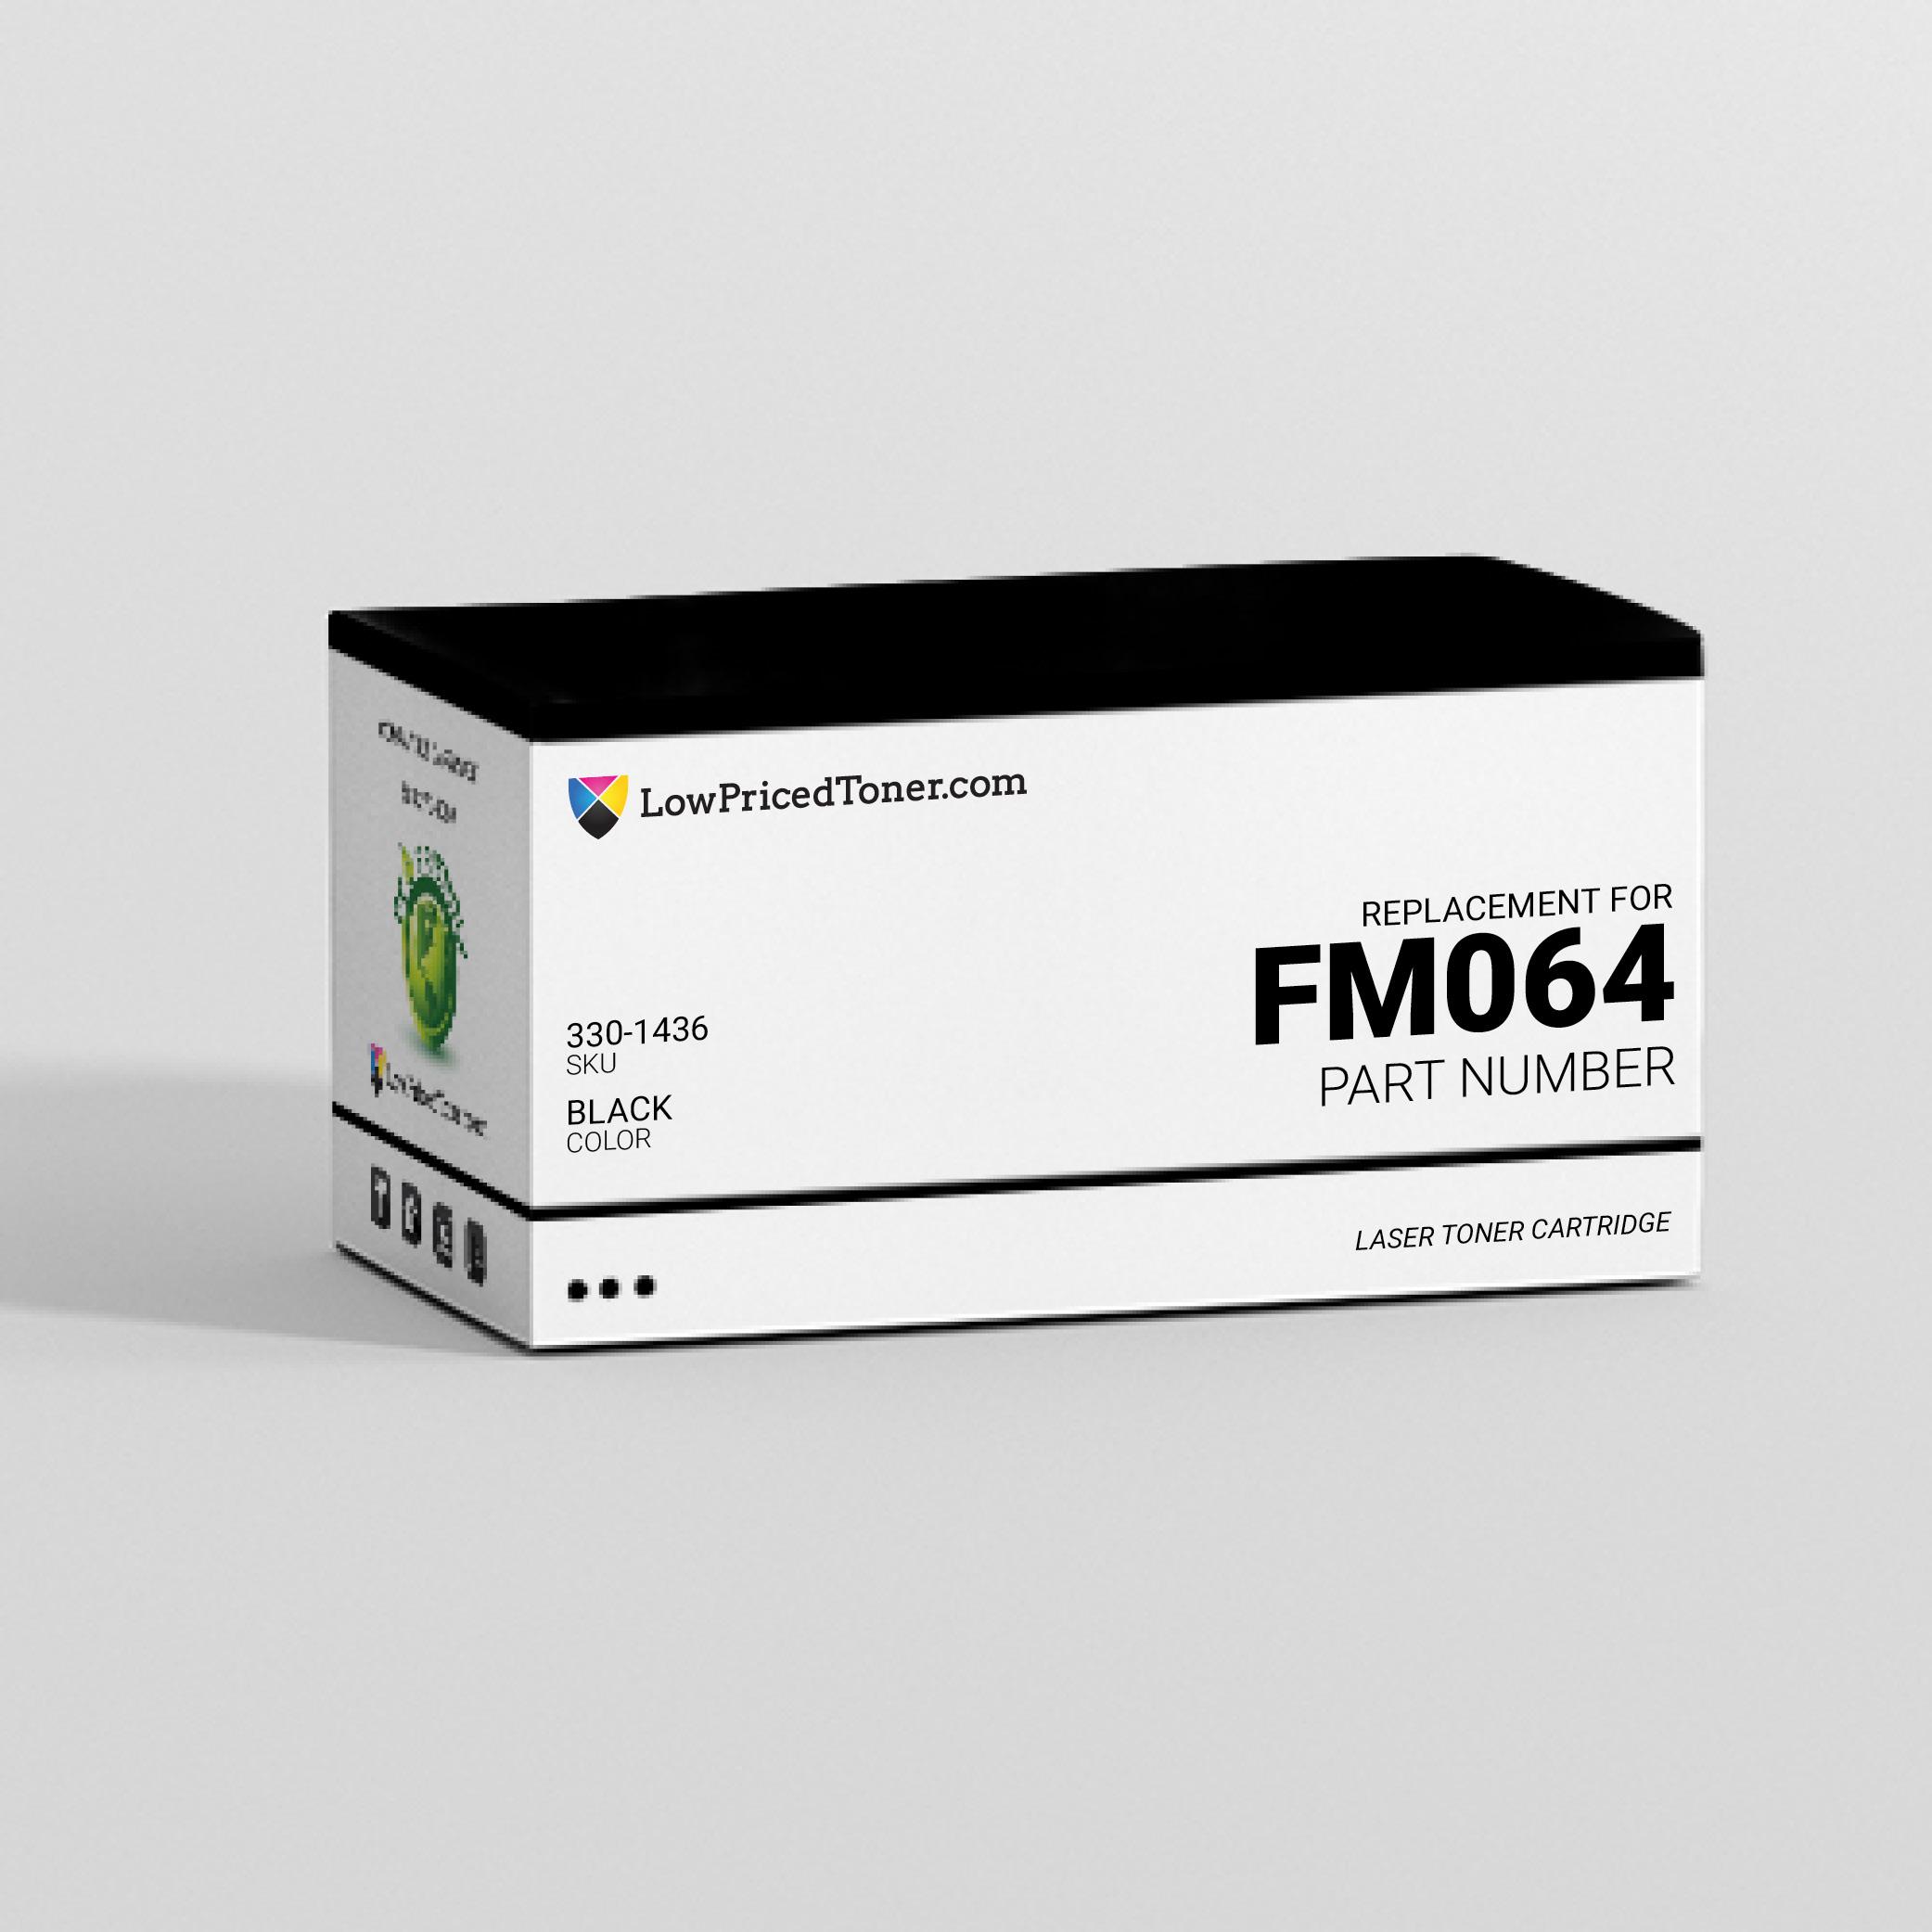 Dell 330-1436 FM064 Compatible Black Laser Toner Cartridge